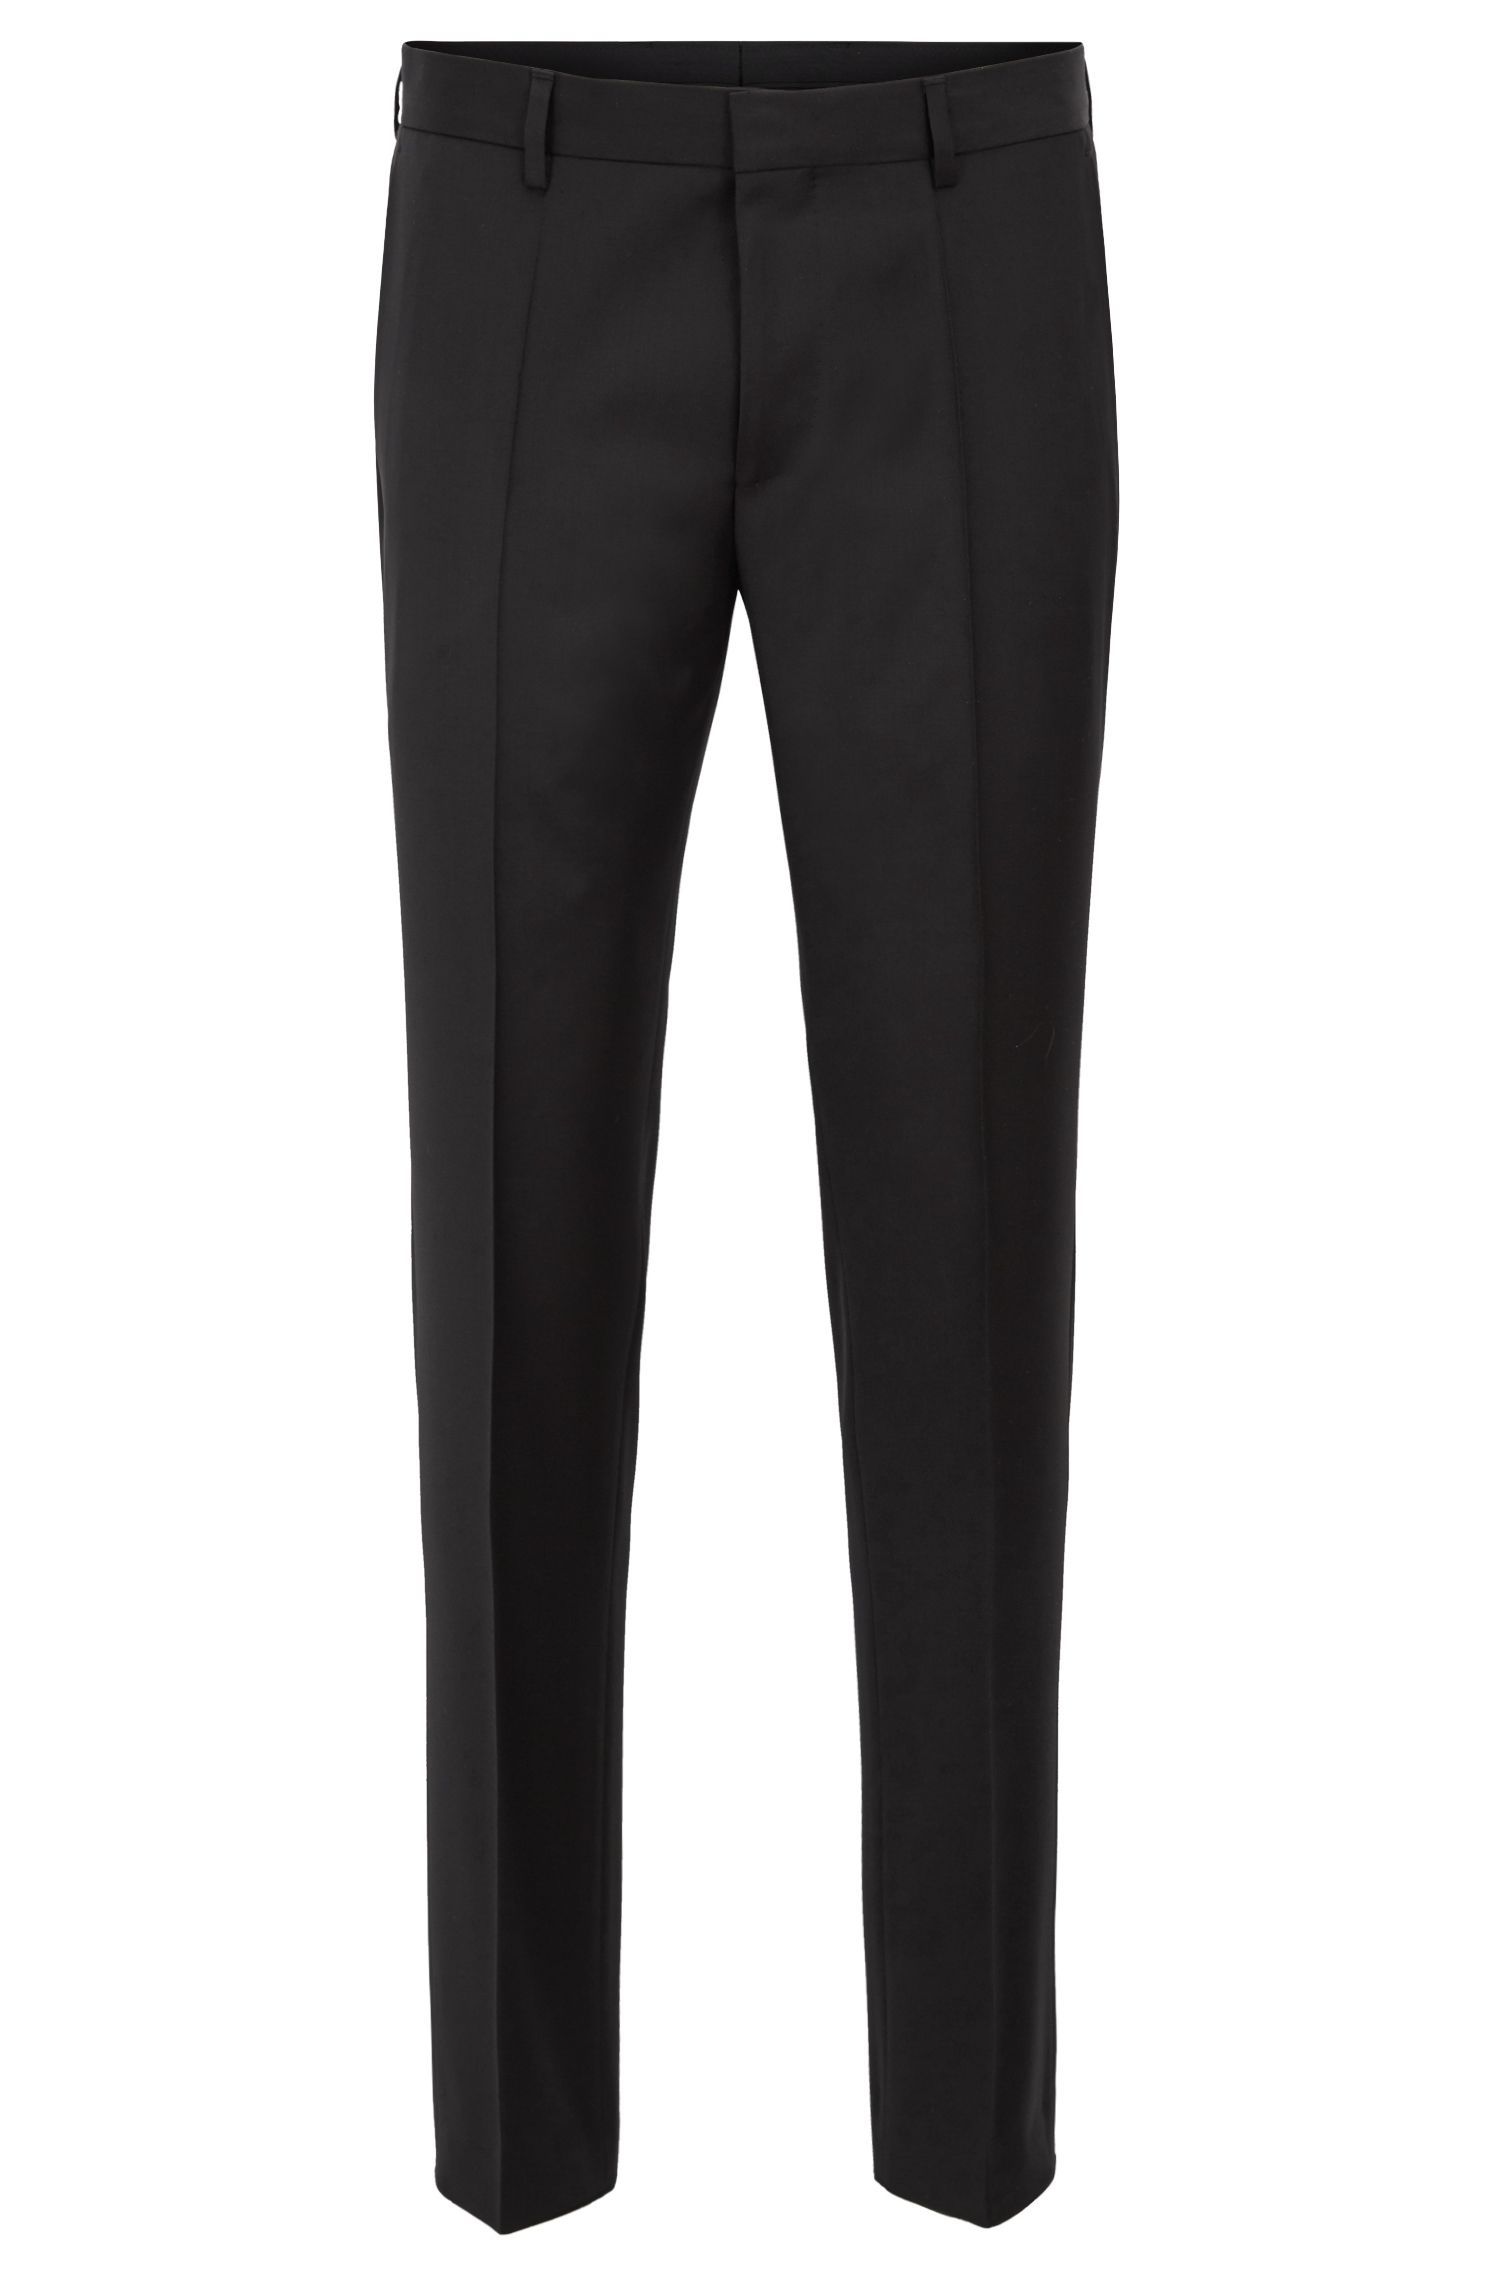 'Gibson Cyl' | Slim Fit, Virgil Wool Dress Pants